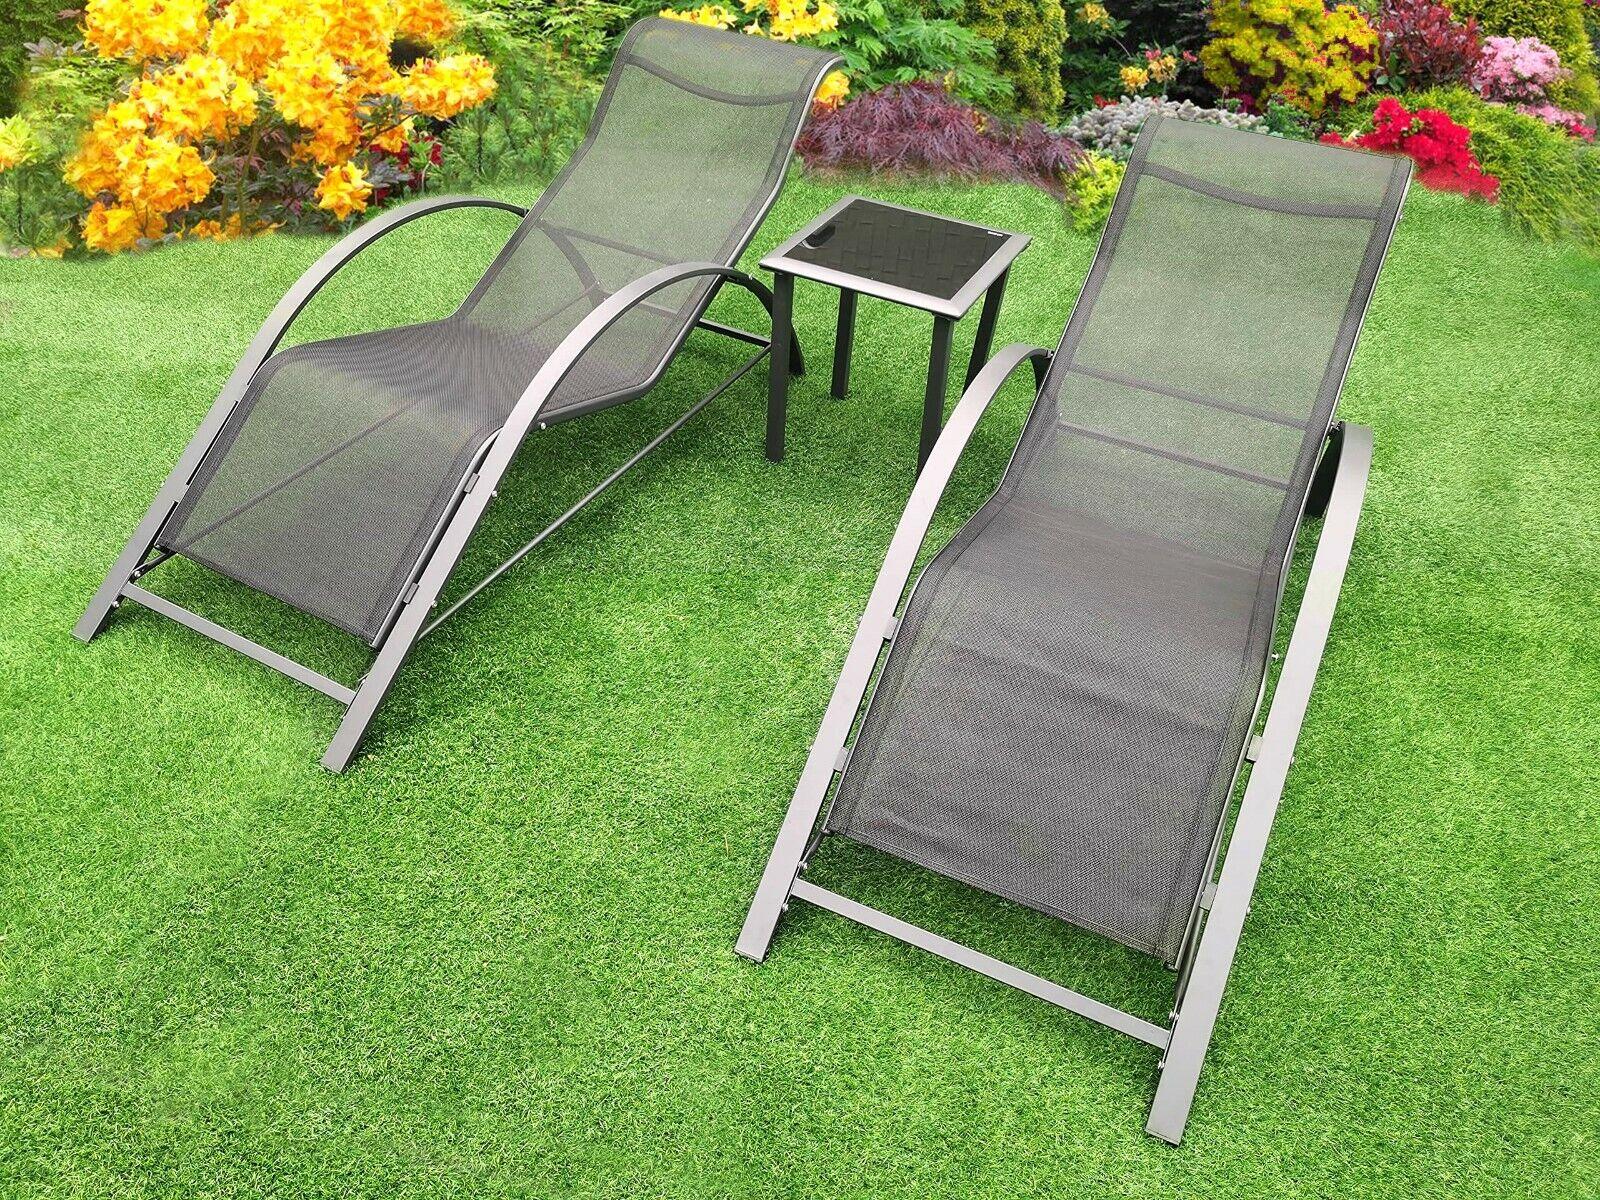 Garden Furniture - 3pc Black Ergonomic Sun Lounger Set + Side Table Chaise Outdoor Garden Furniture